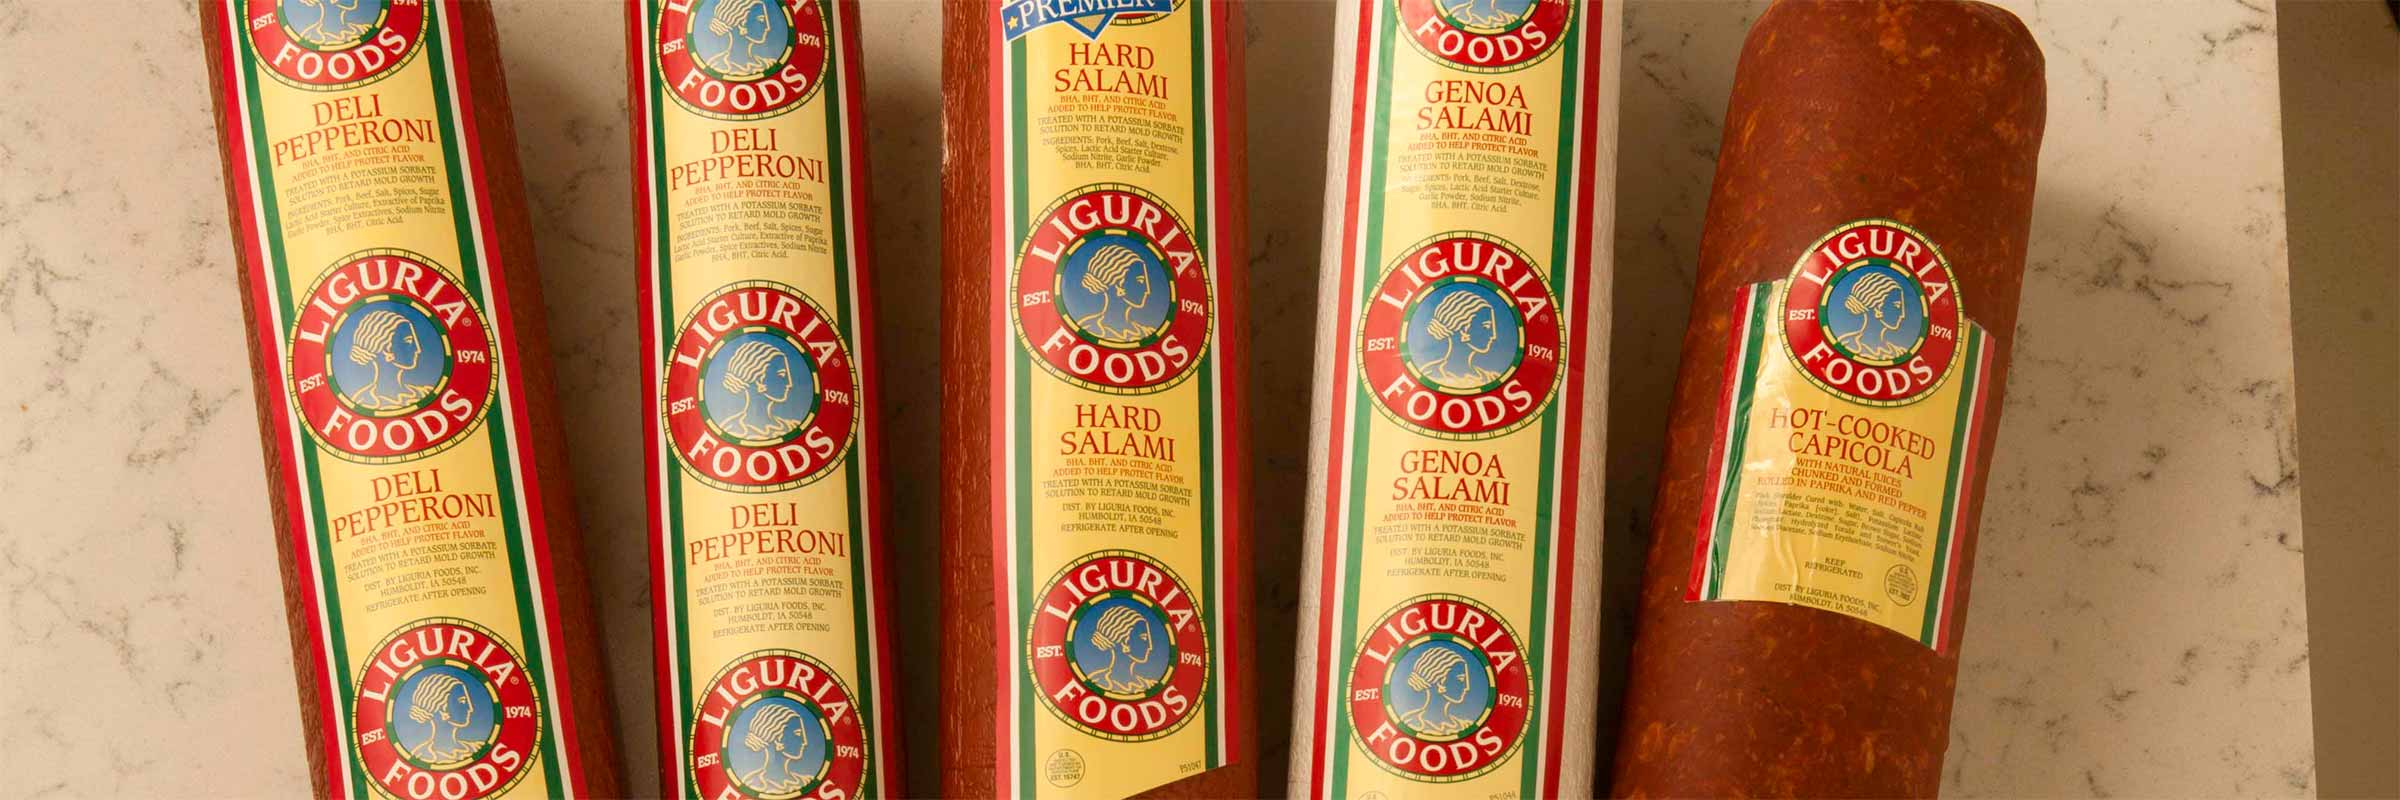 Find A Distributor Near You Liguria Foods